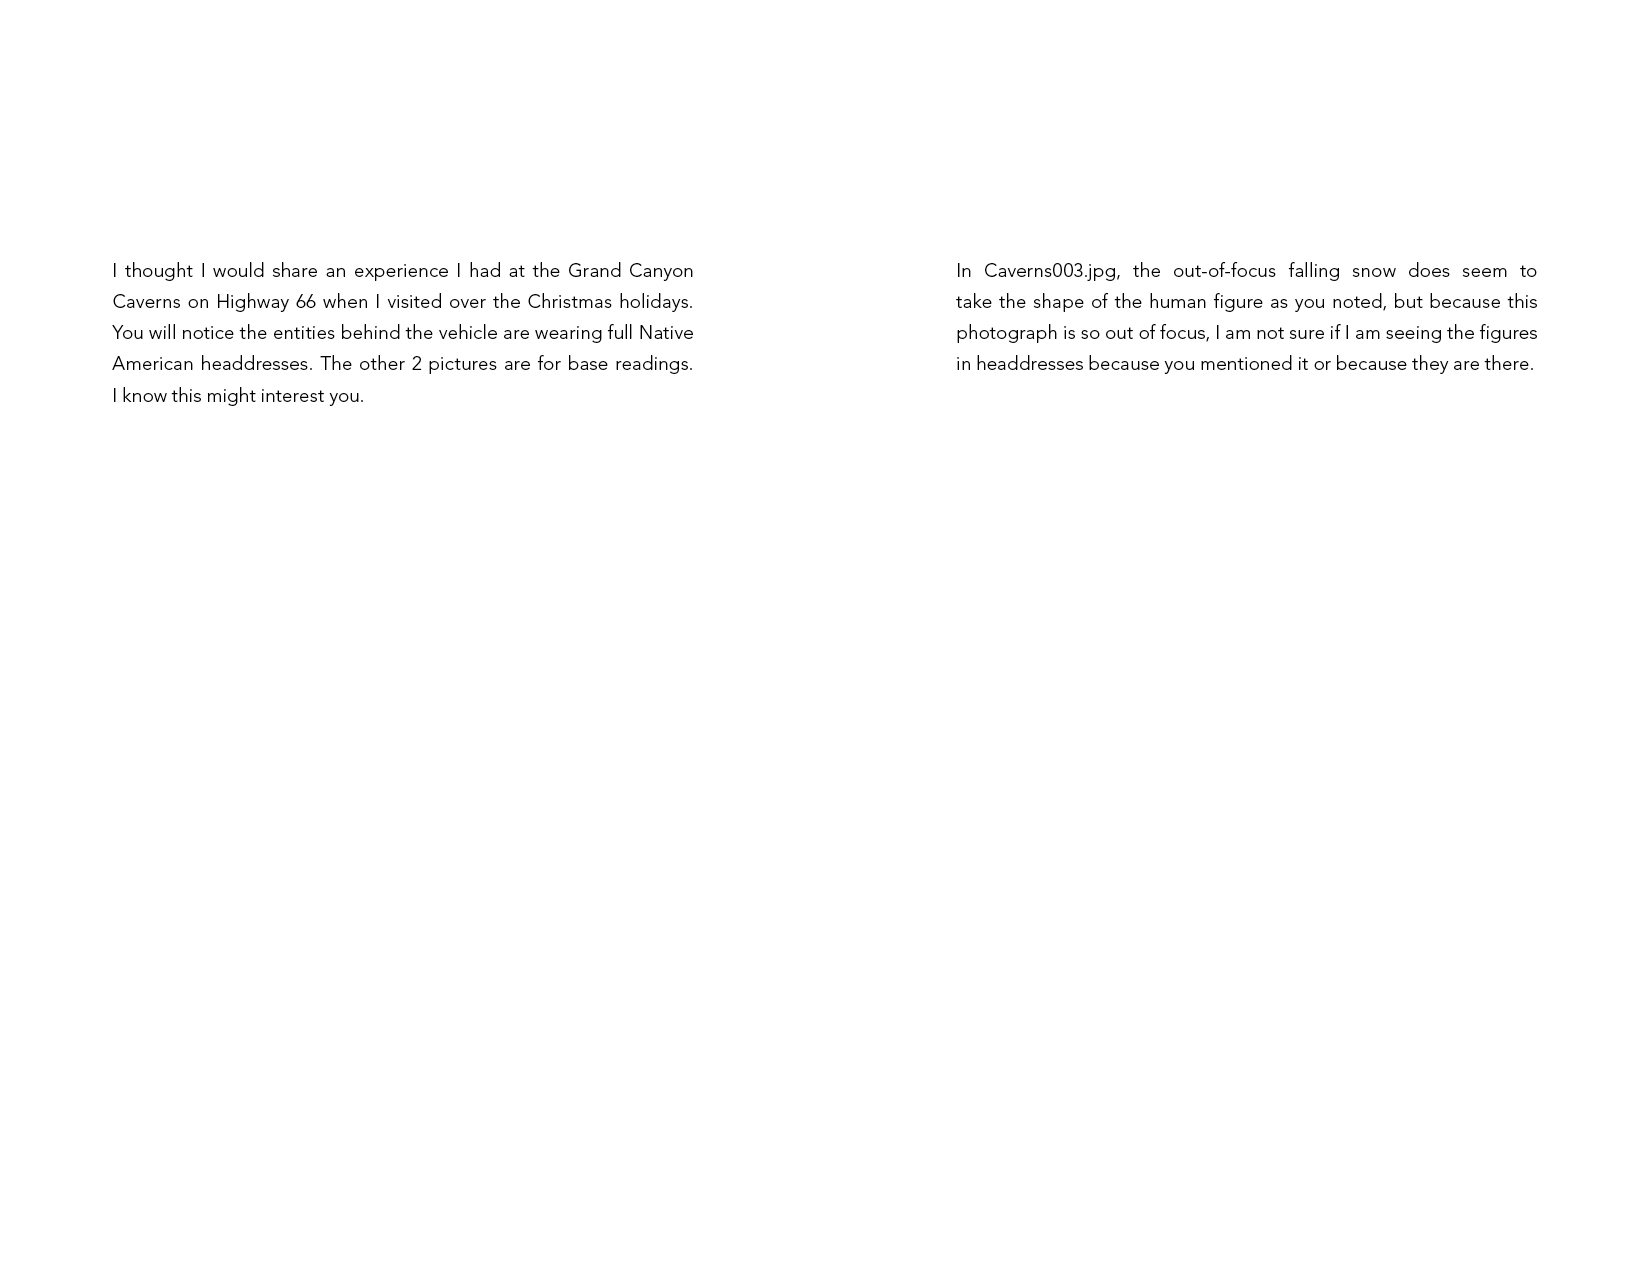 ElizabethMoran_Correspondence1_pages14.png